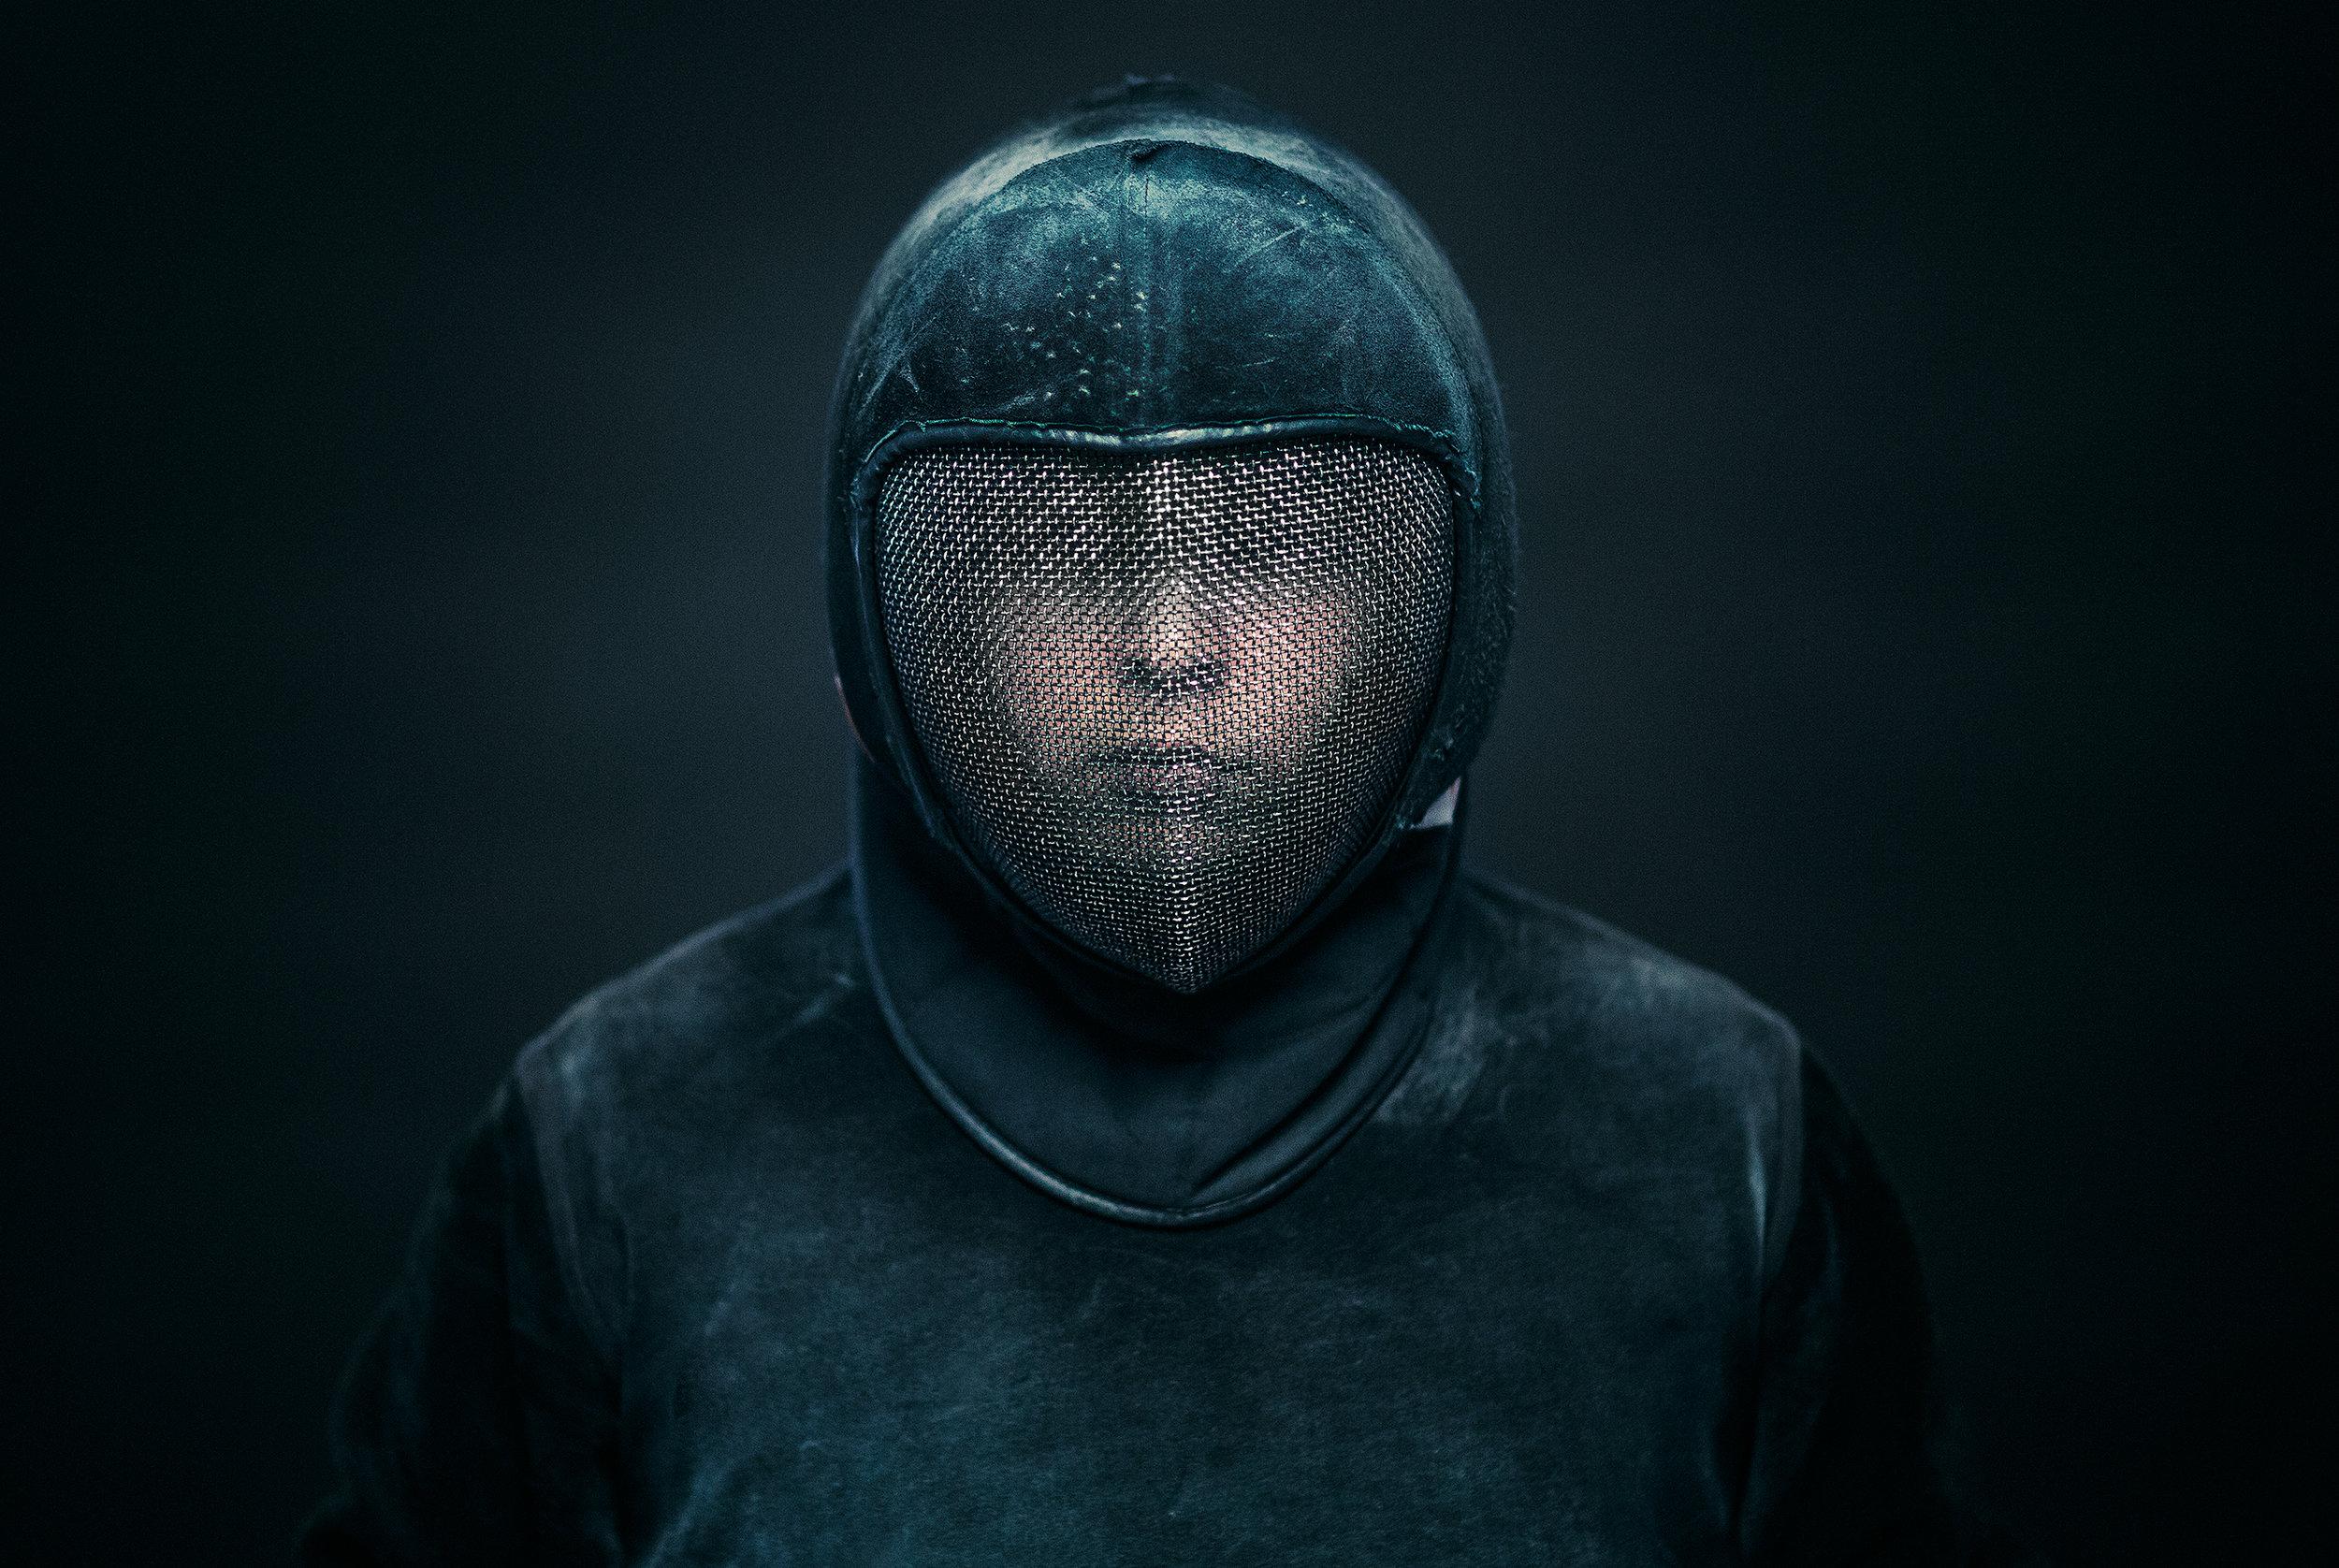 Oscar-arribas-esgrima-maestro-fencing-master-fencer-fechten-scherma-escrime-portrait-fotografo-retrato-photographer004.jpg